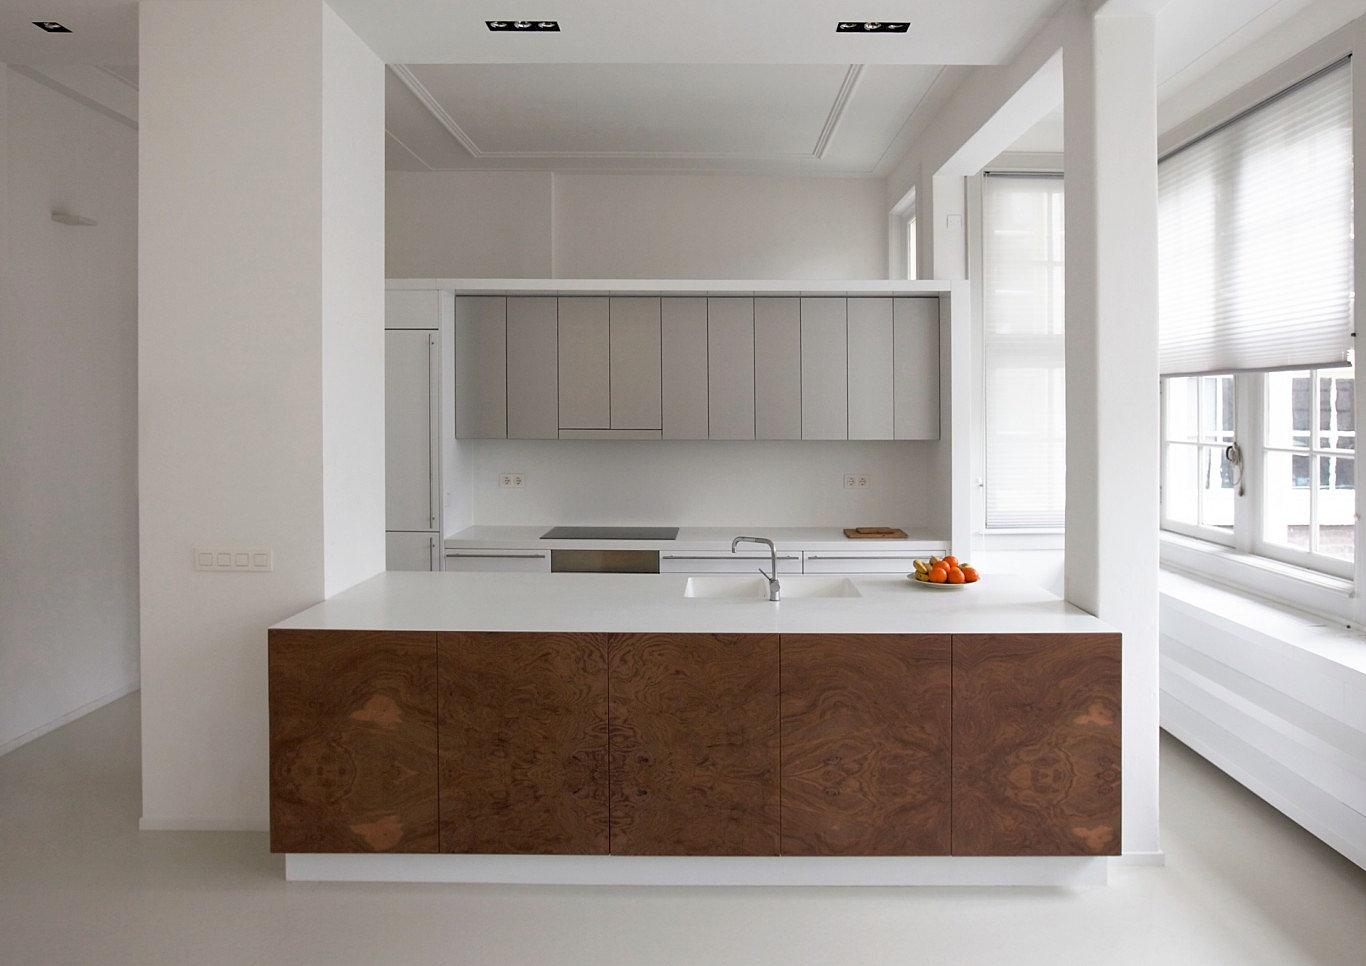 Maatwerk Greeploze Keuken: Maatwerk greeploze keuken hoogglans wit ...